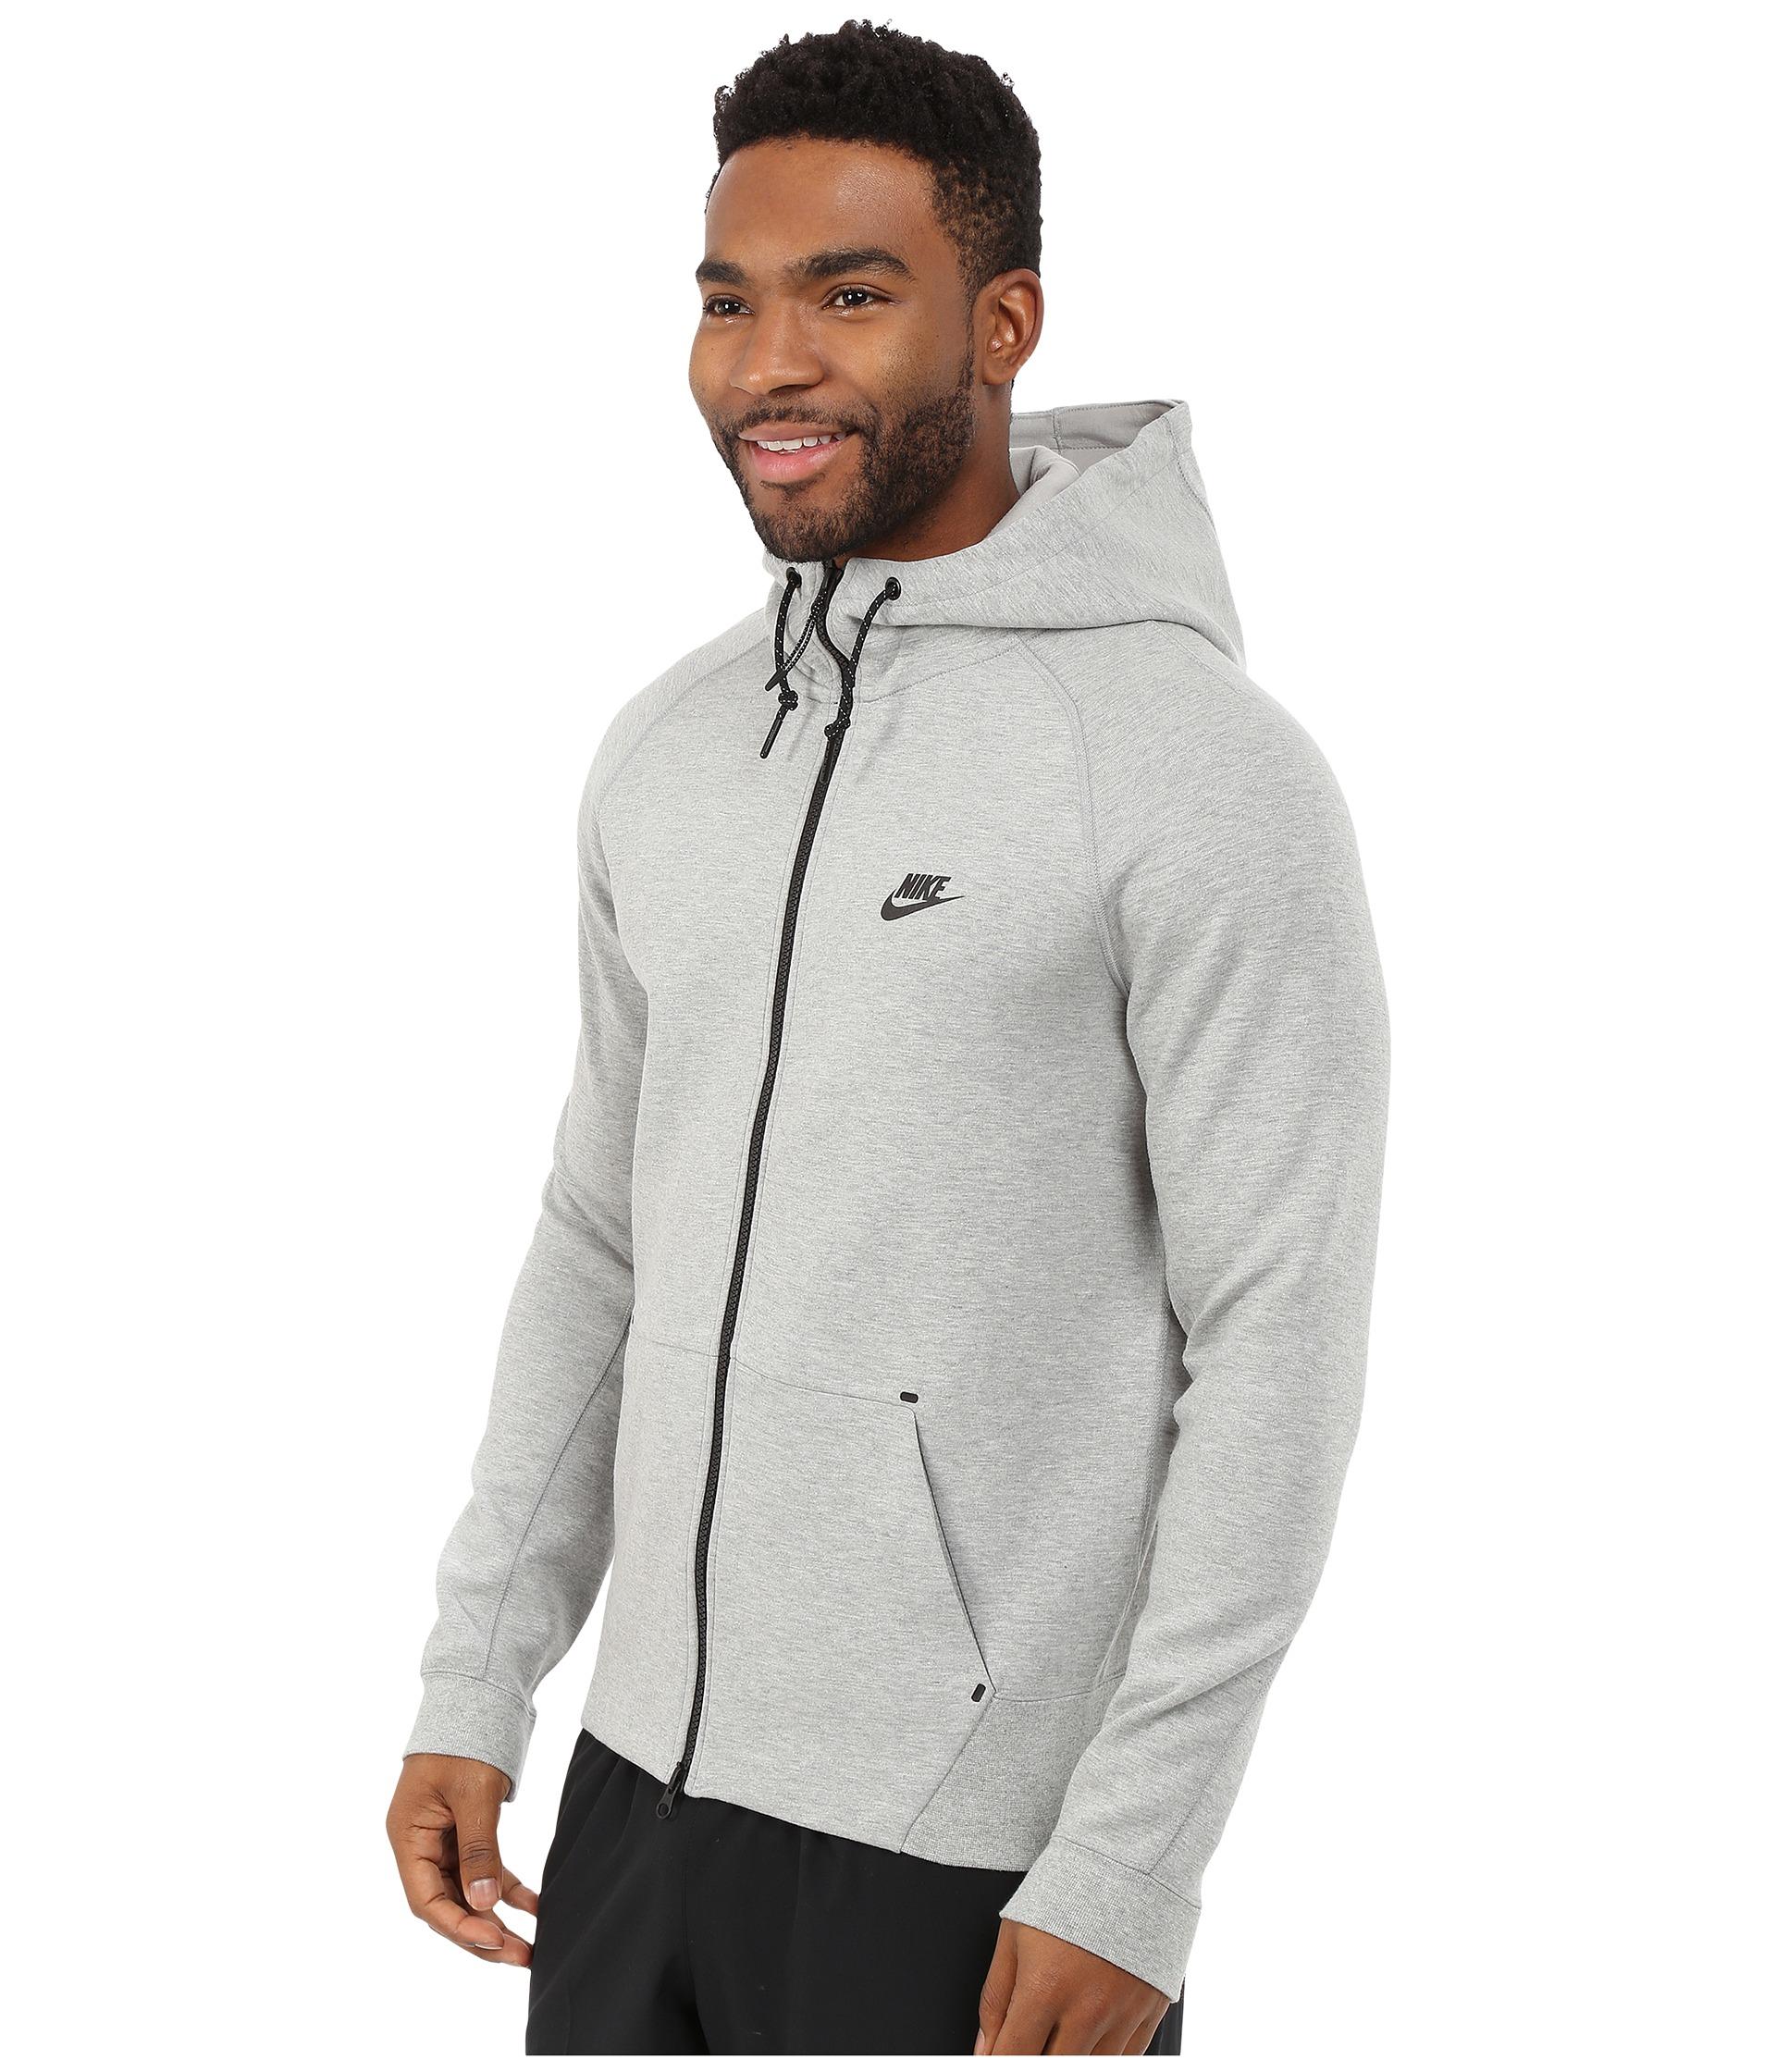 1940045bc9 Lyst - Nike Tech Fleece Aw77 1.0 Full-zip Hoodie in Gray for Men